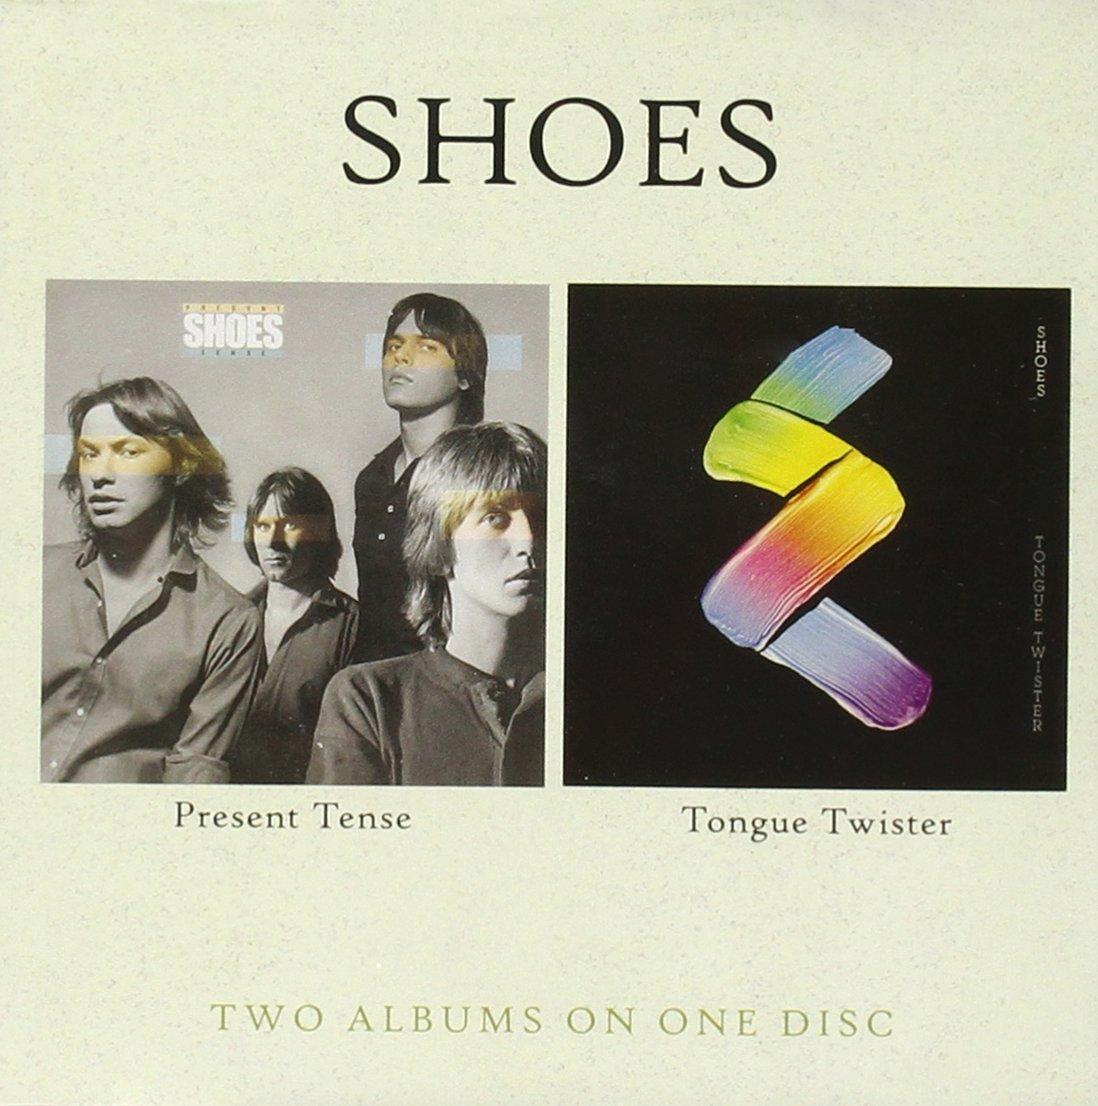 Present Tense/Tongue Twister                                                                                                                                                                                                                                                    <span class=